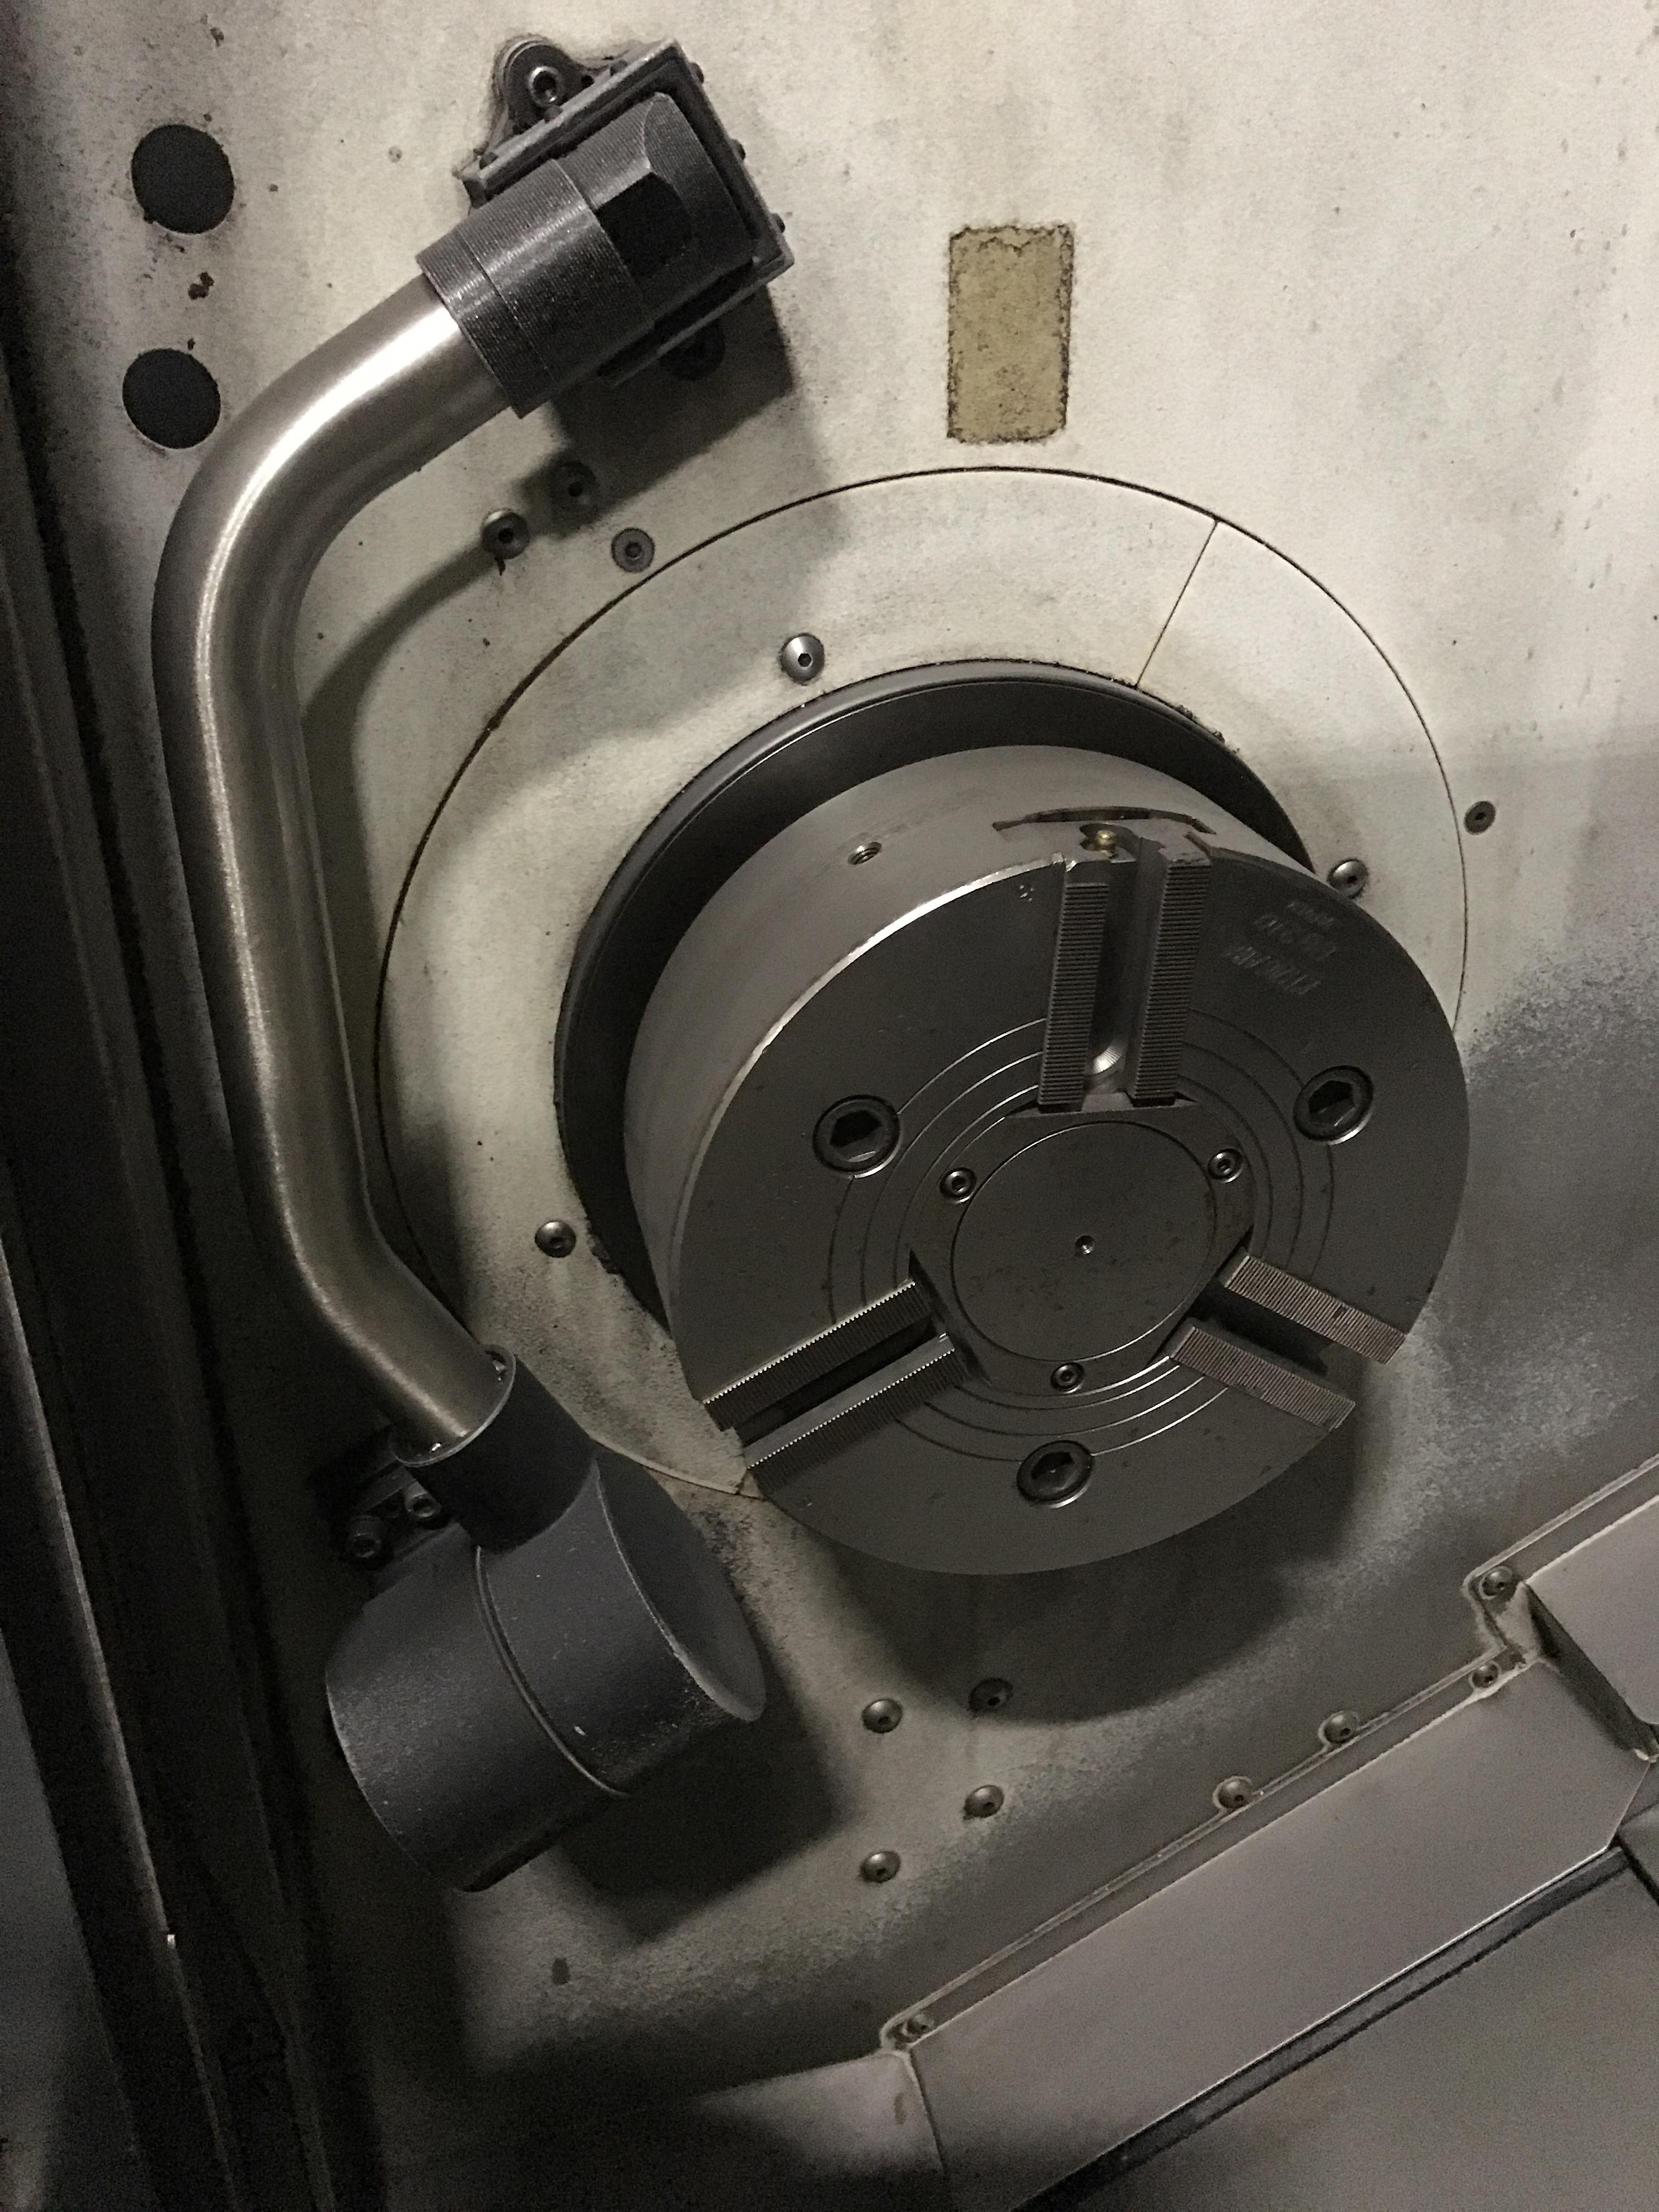 2005 MORI SEIKI NL2500MC/700 - CNC Horizontal Lathe